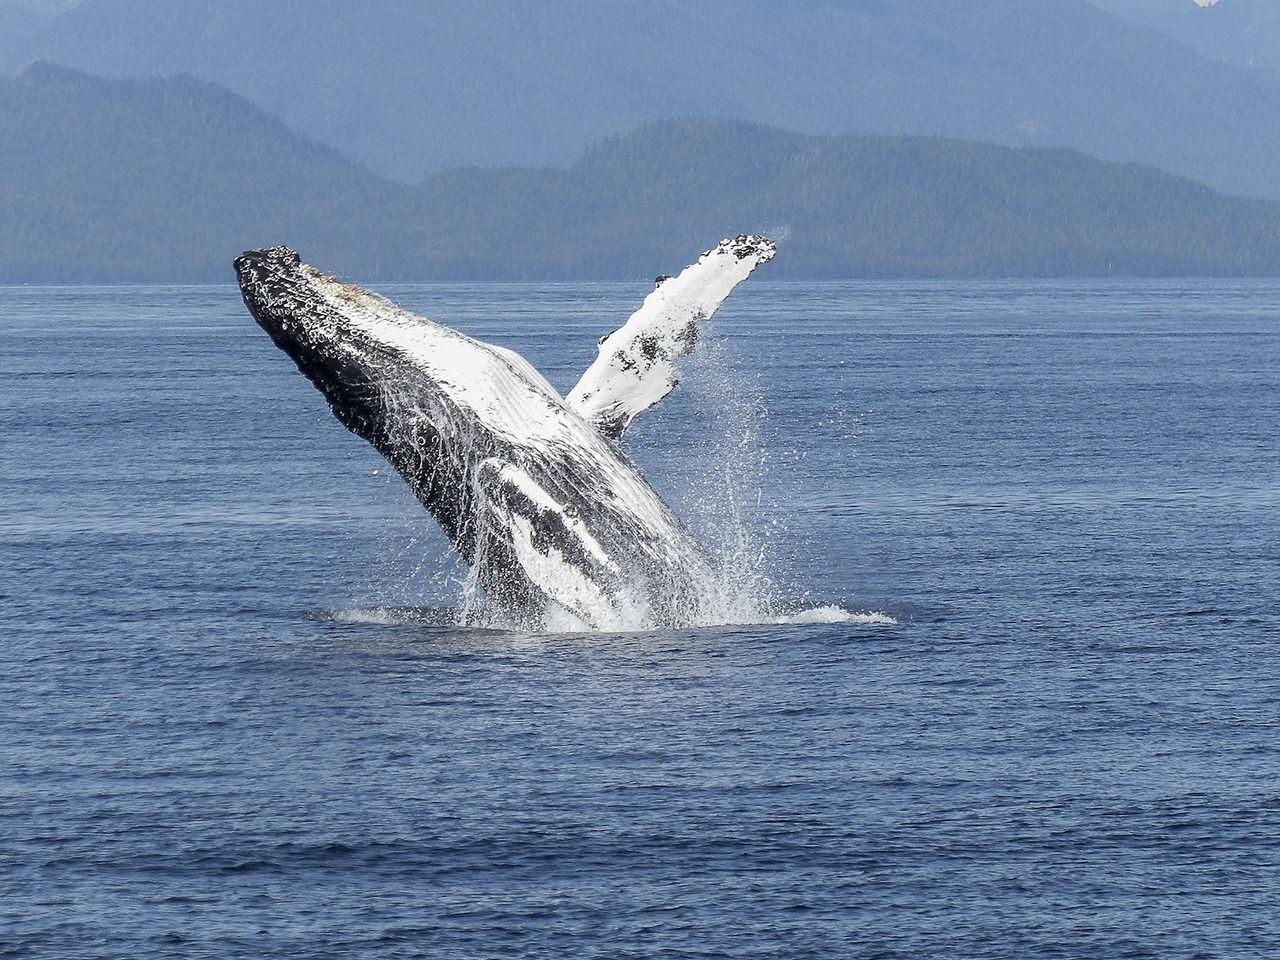 Baleine à bosse, Nuquí